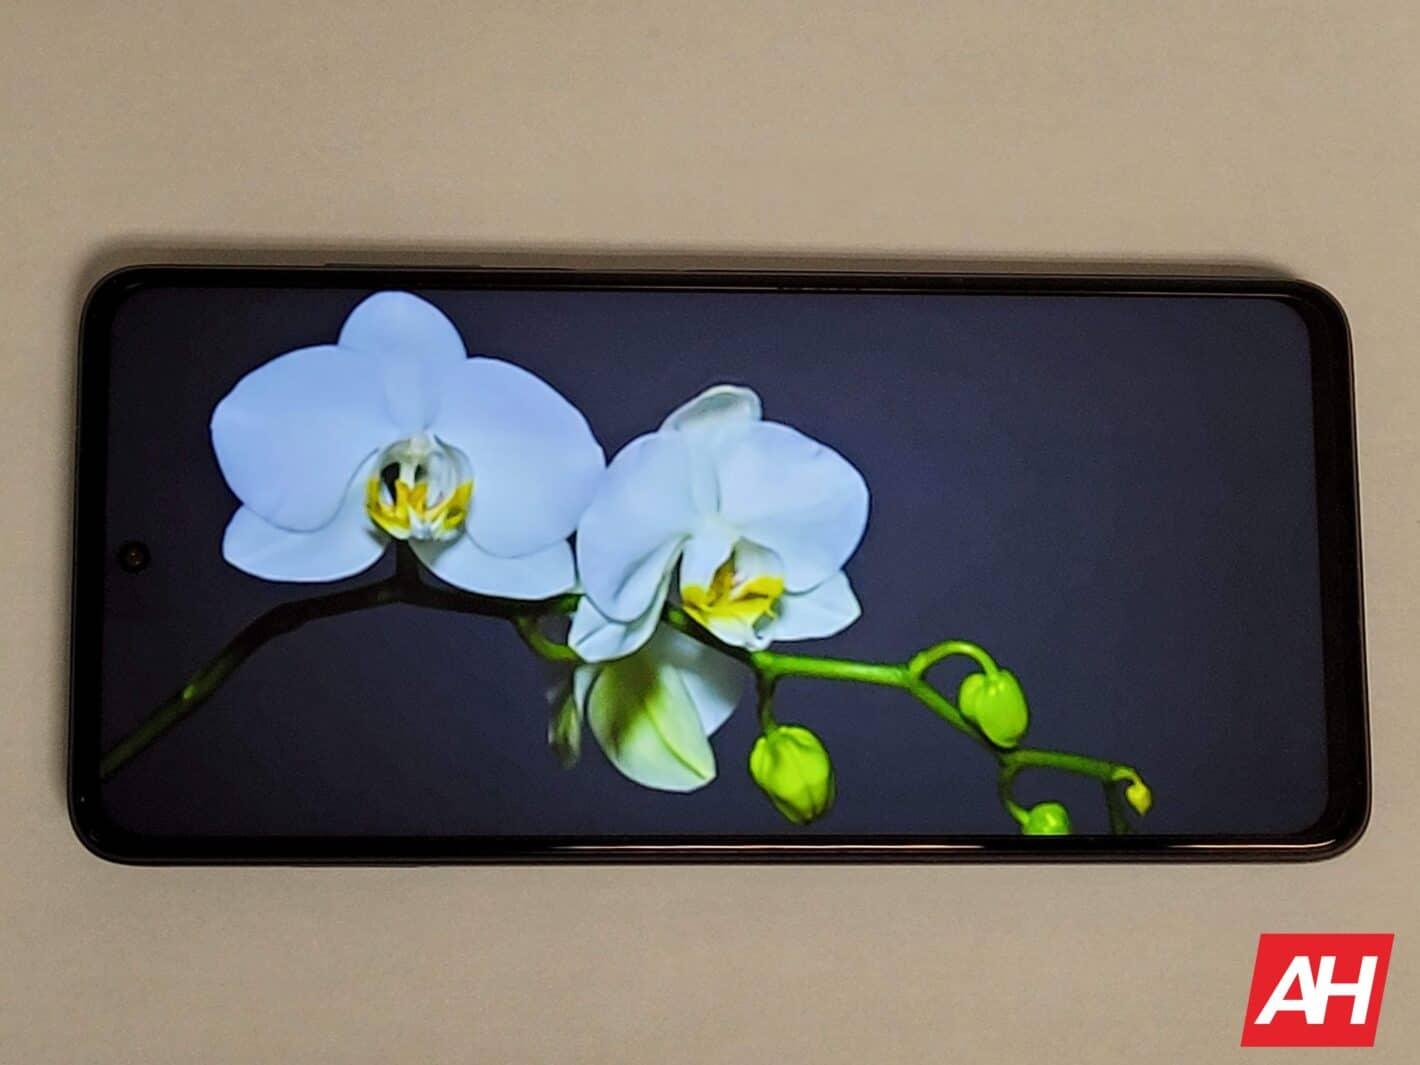 Poco X3 Pro AH HR Display2